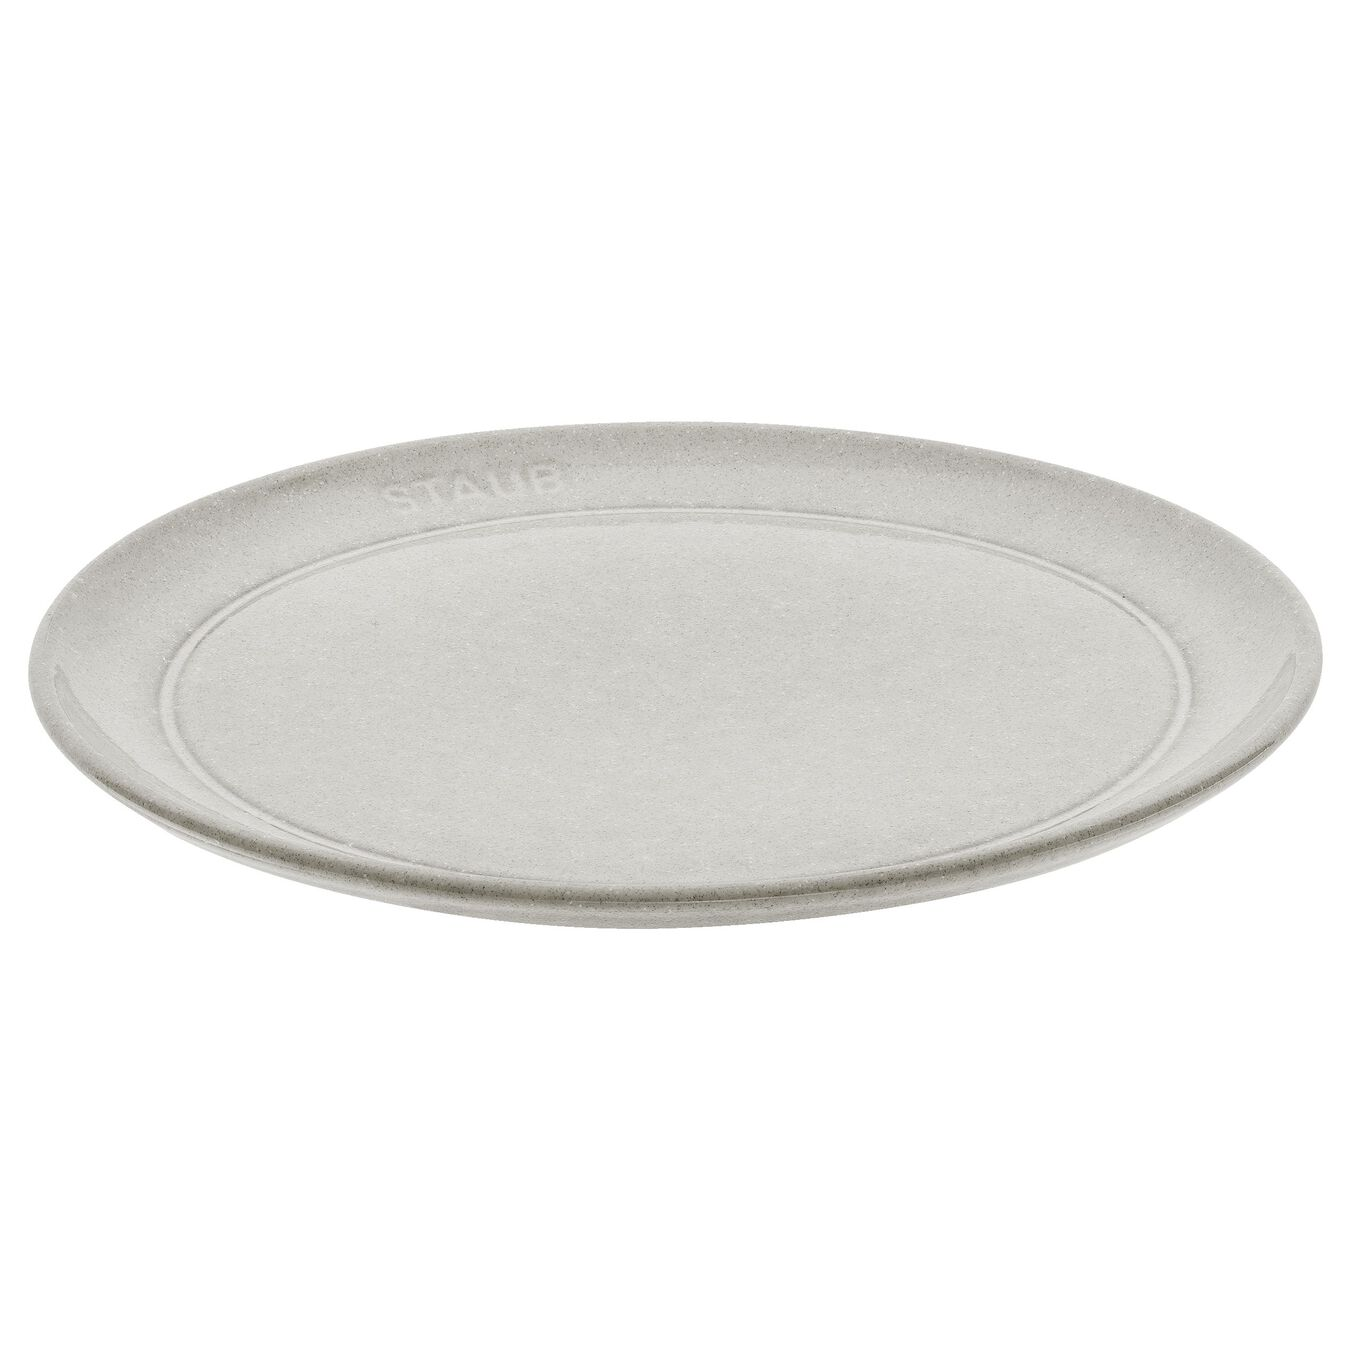 Tallrik plan 20 cm, Keramiskt, White Truffle,,large 1